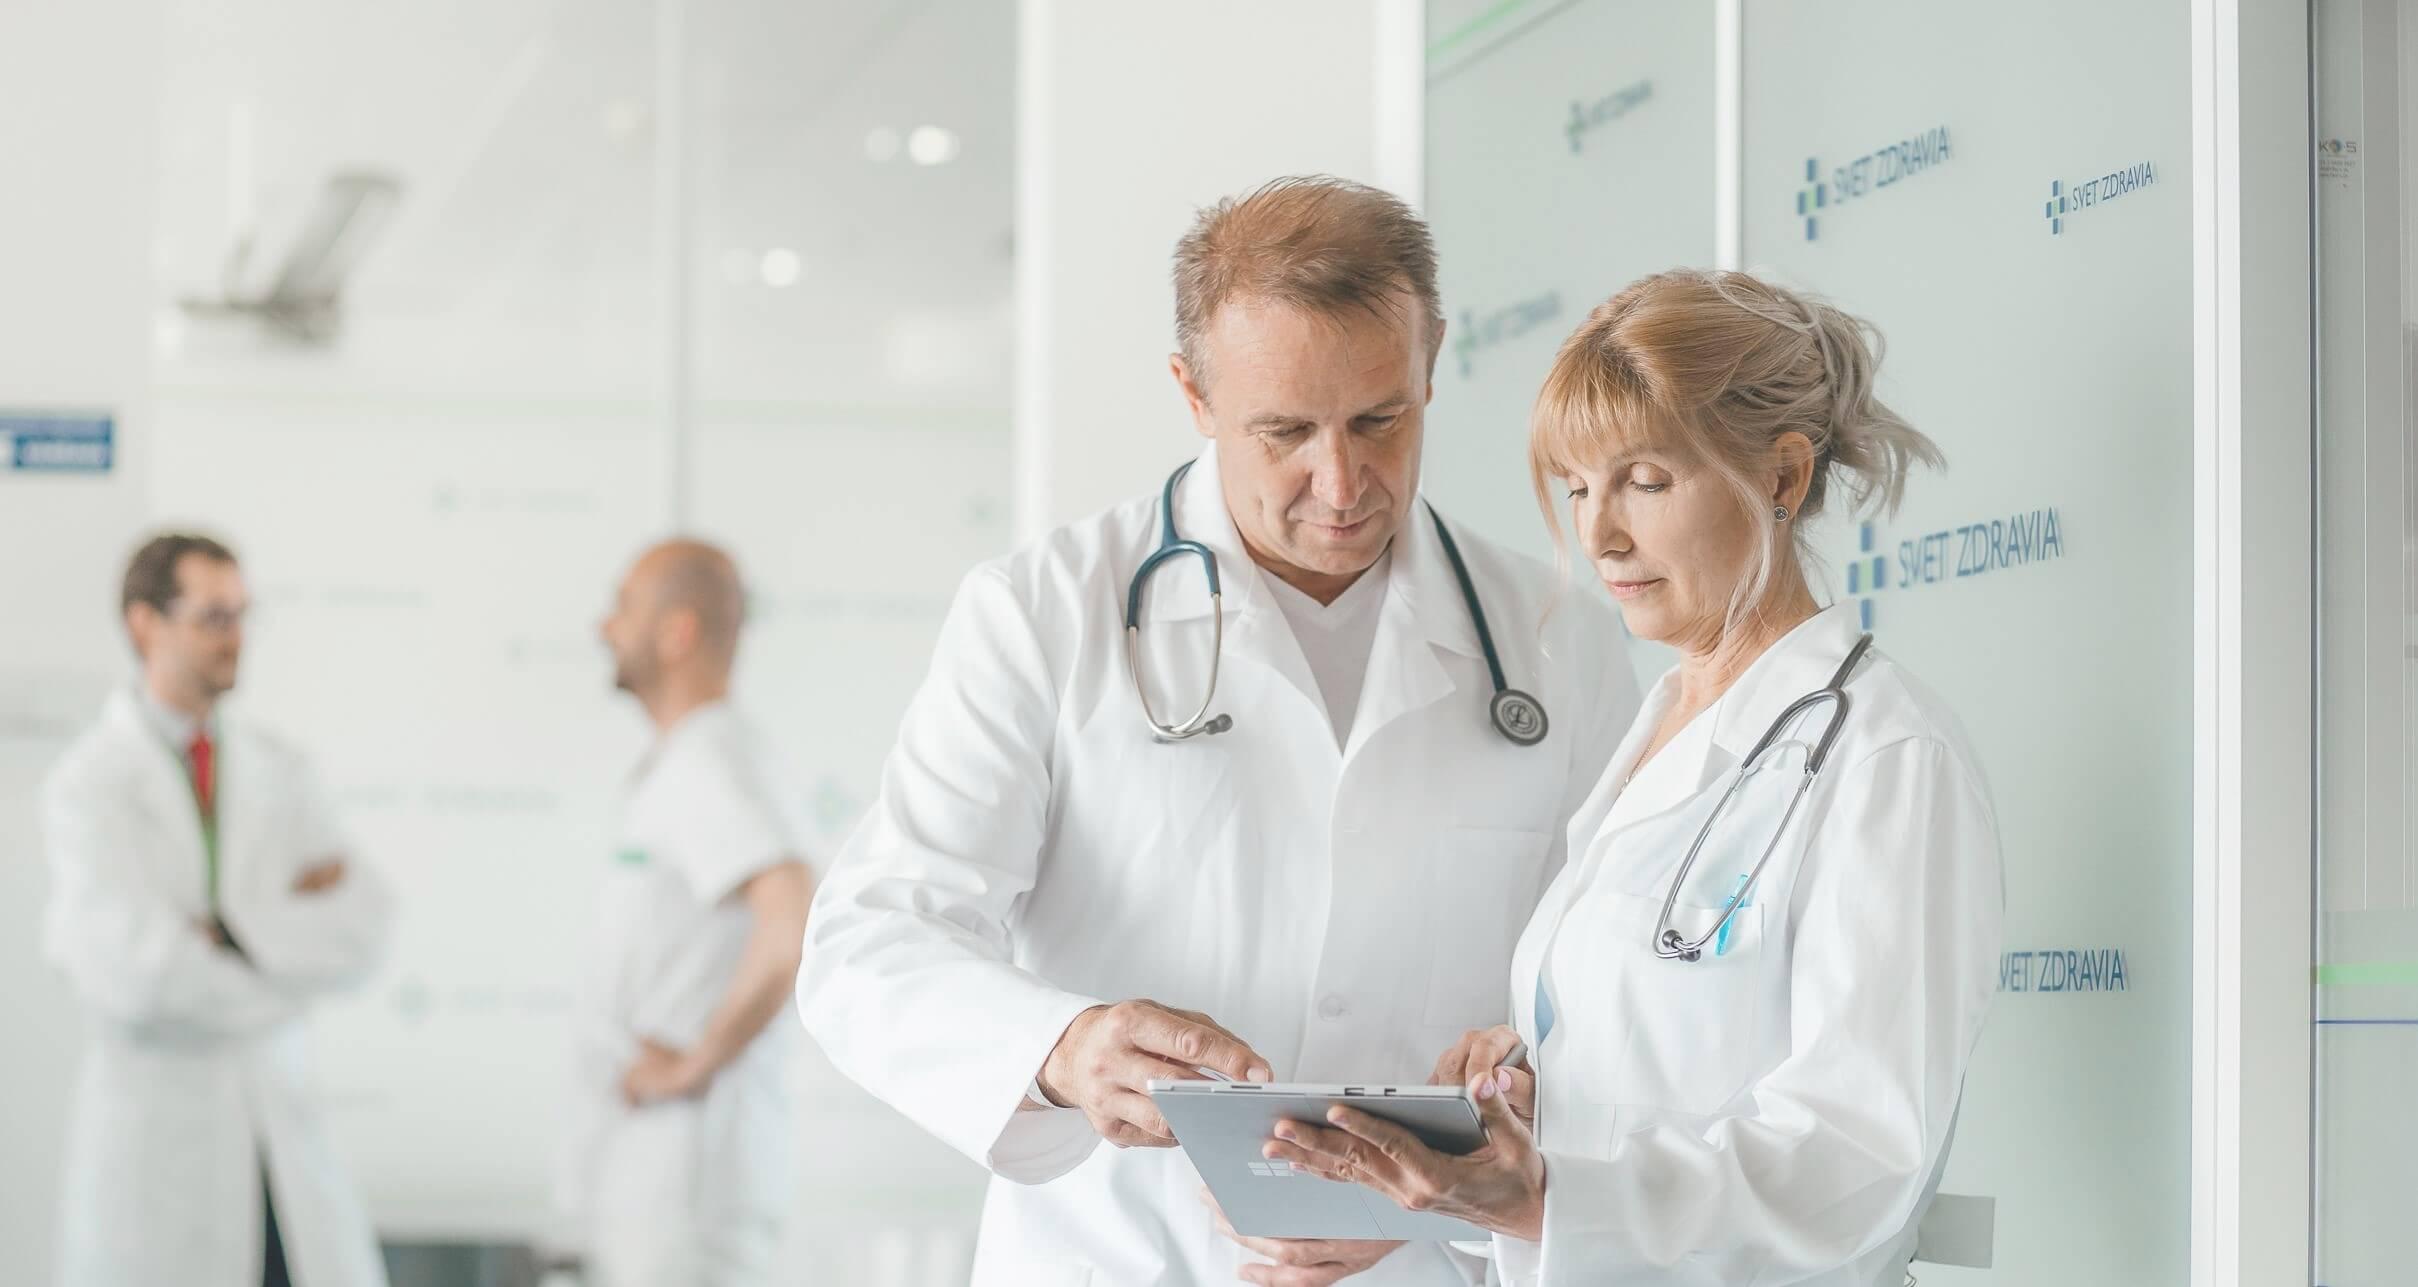 nemocnica bory moznosti karierneho rastu miroslav halecky helga kajanova konzultacia edukacia 3